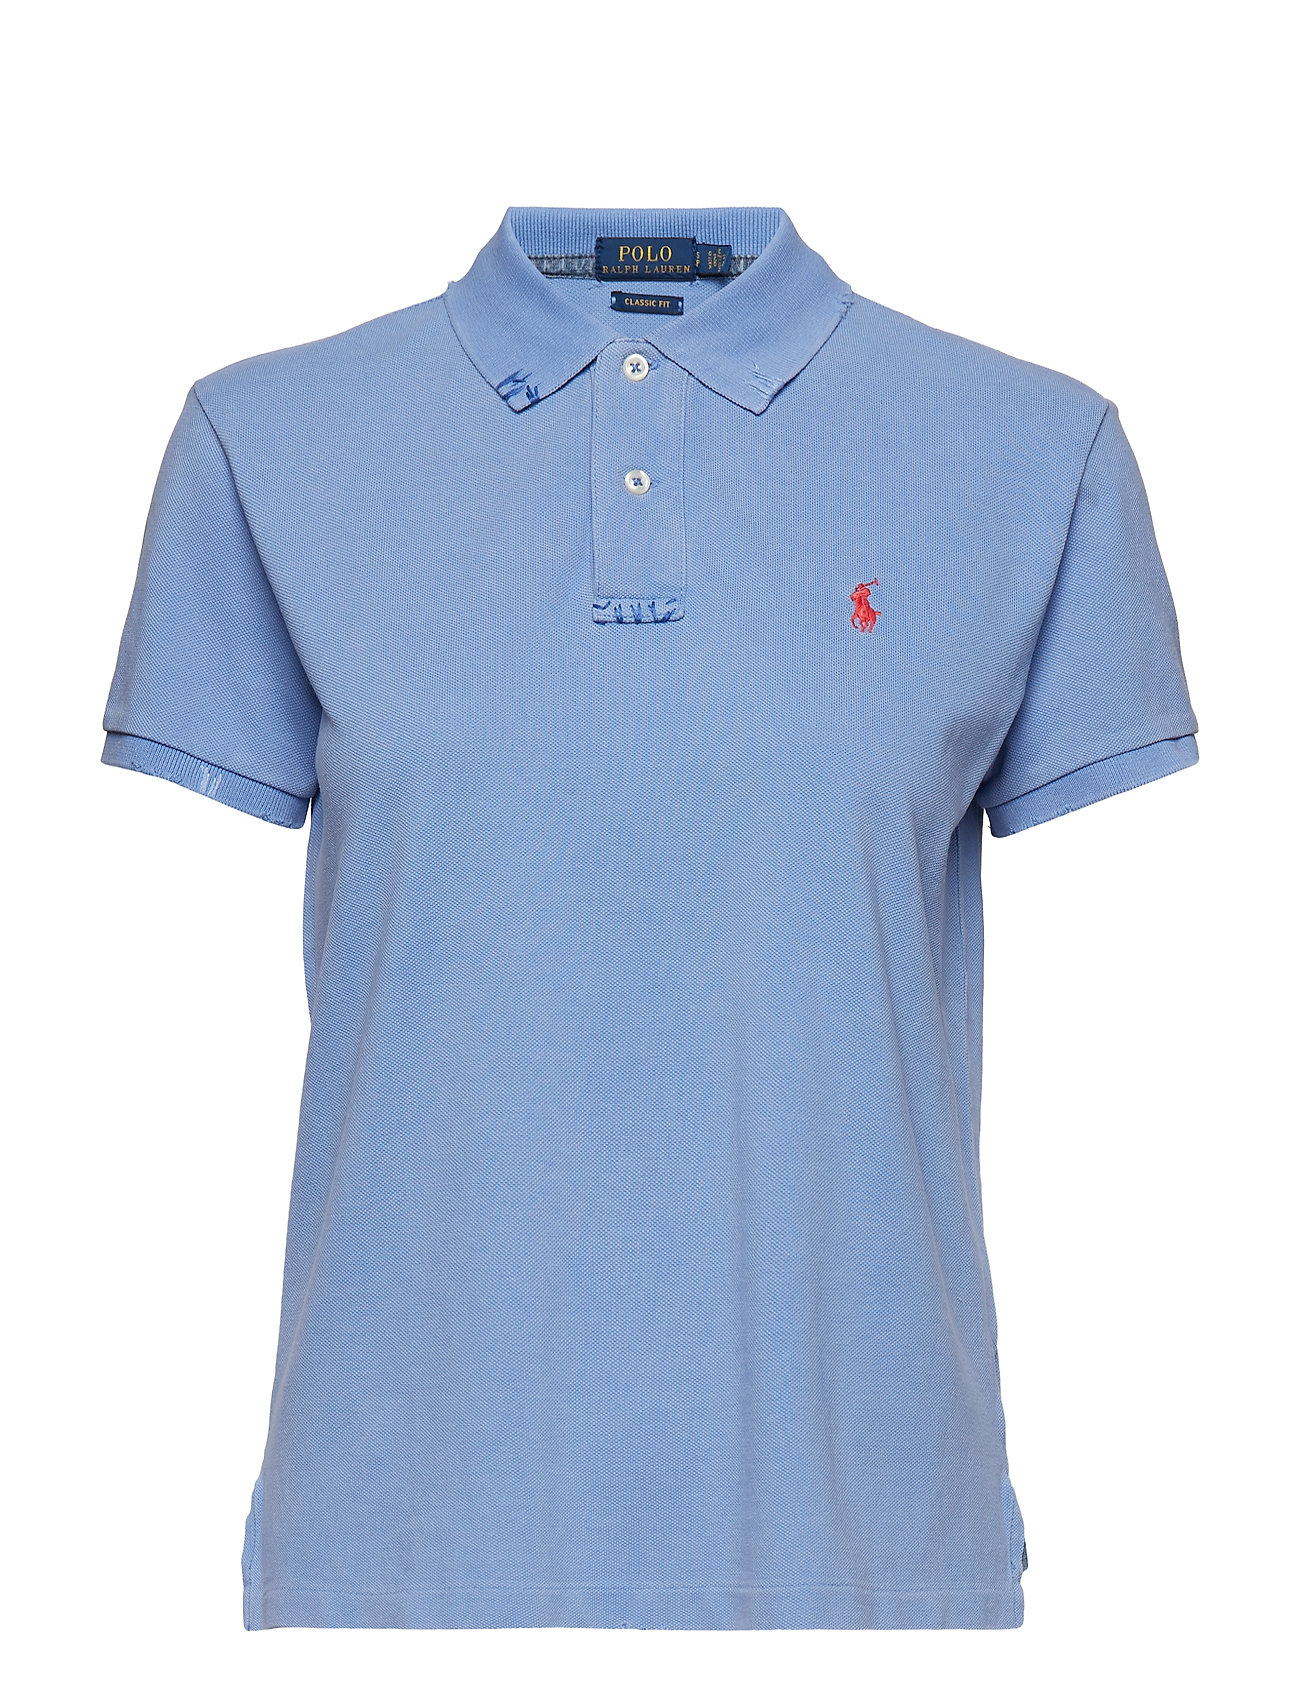 Polo Ralph Lauren Classic Fit Cotton Polo Shirt